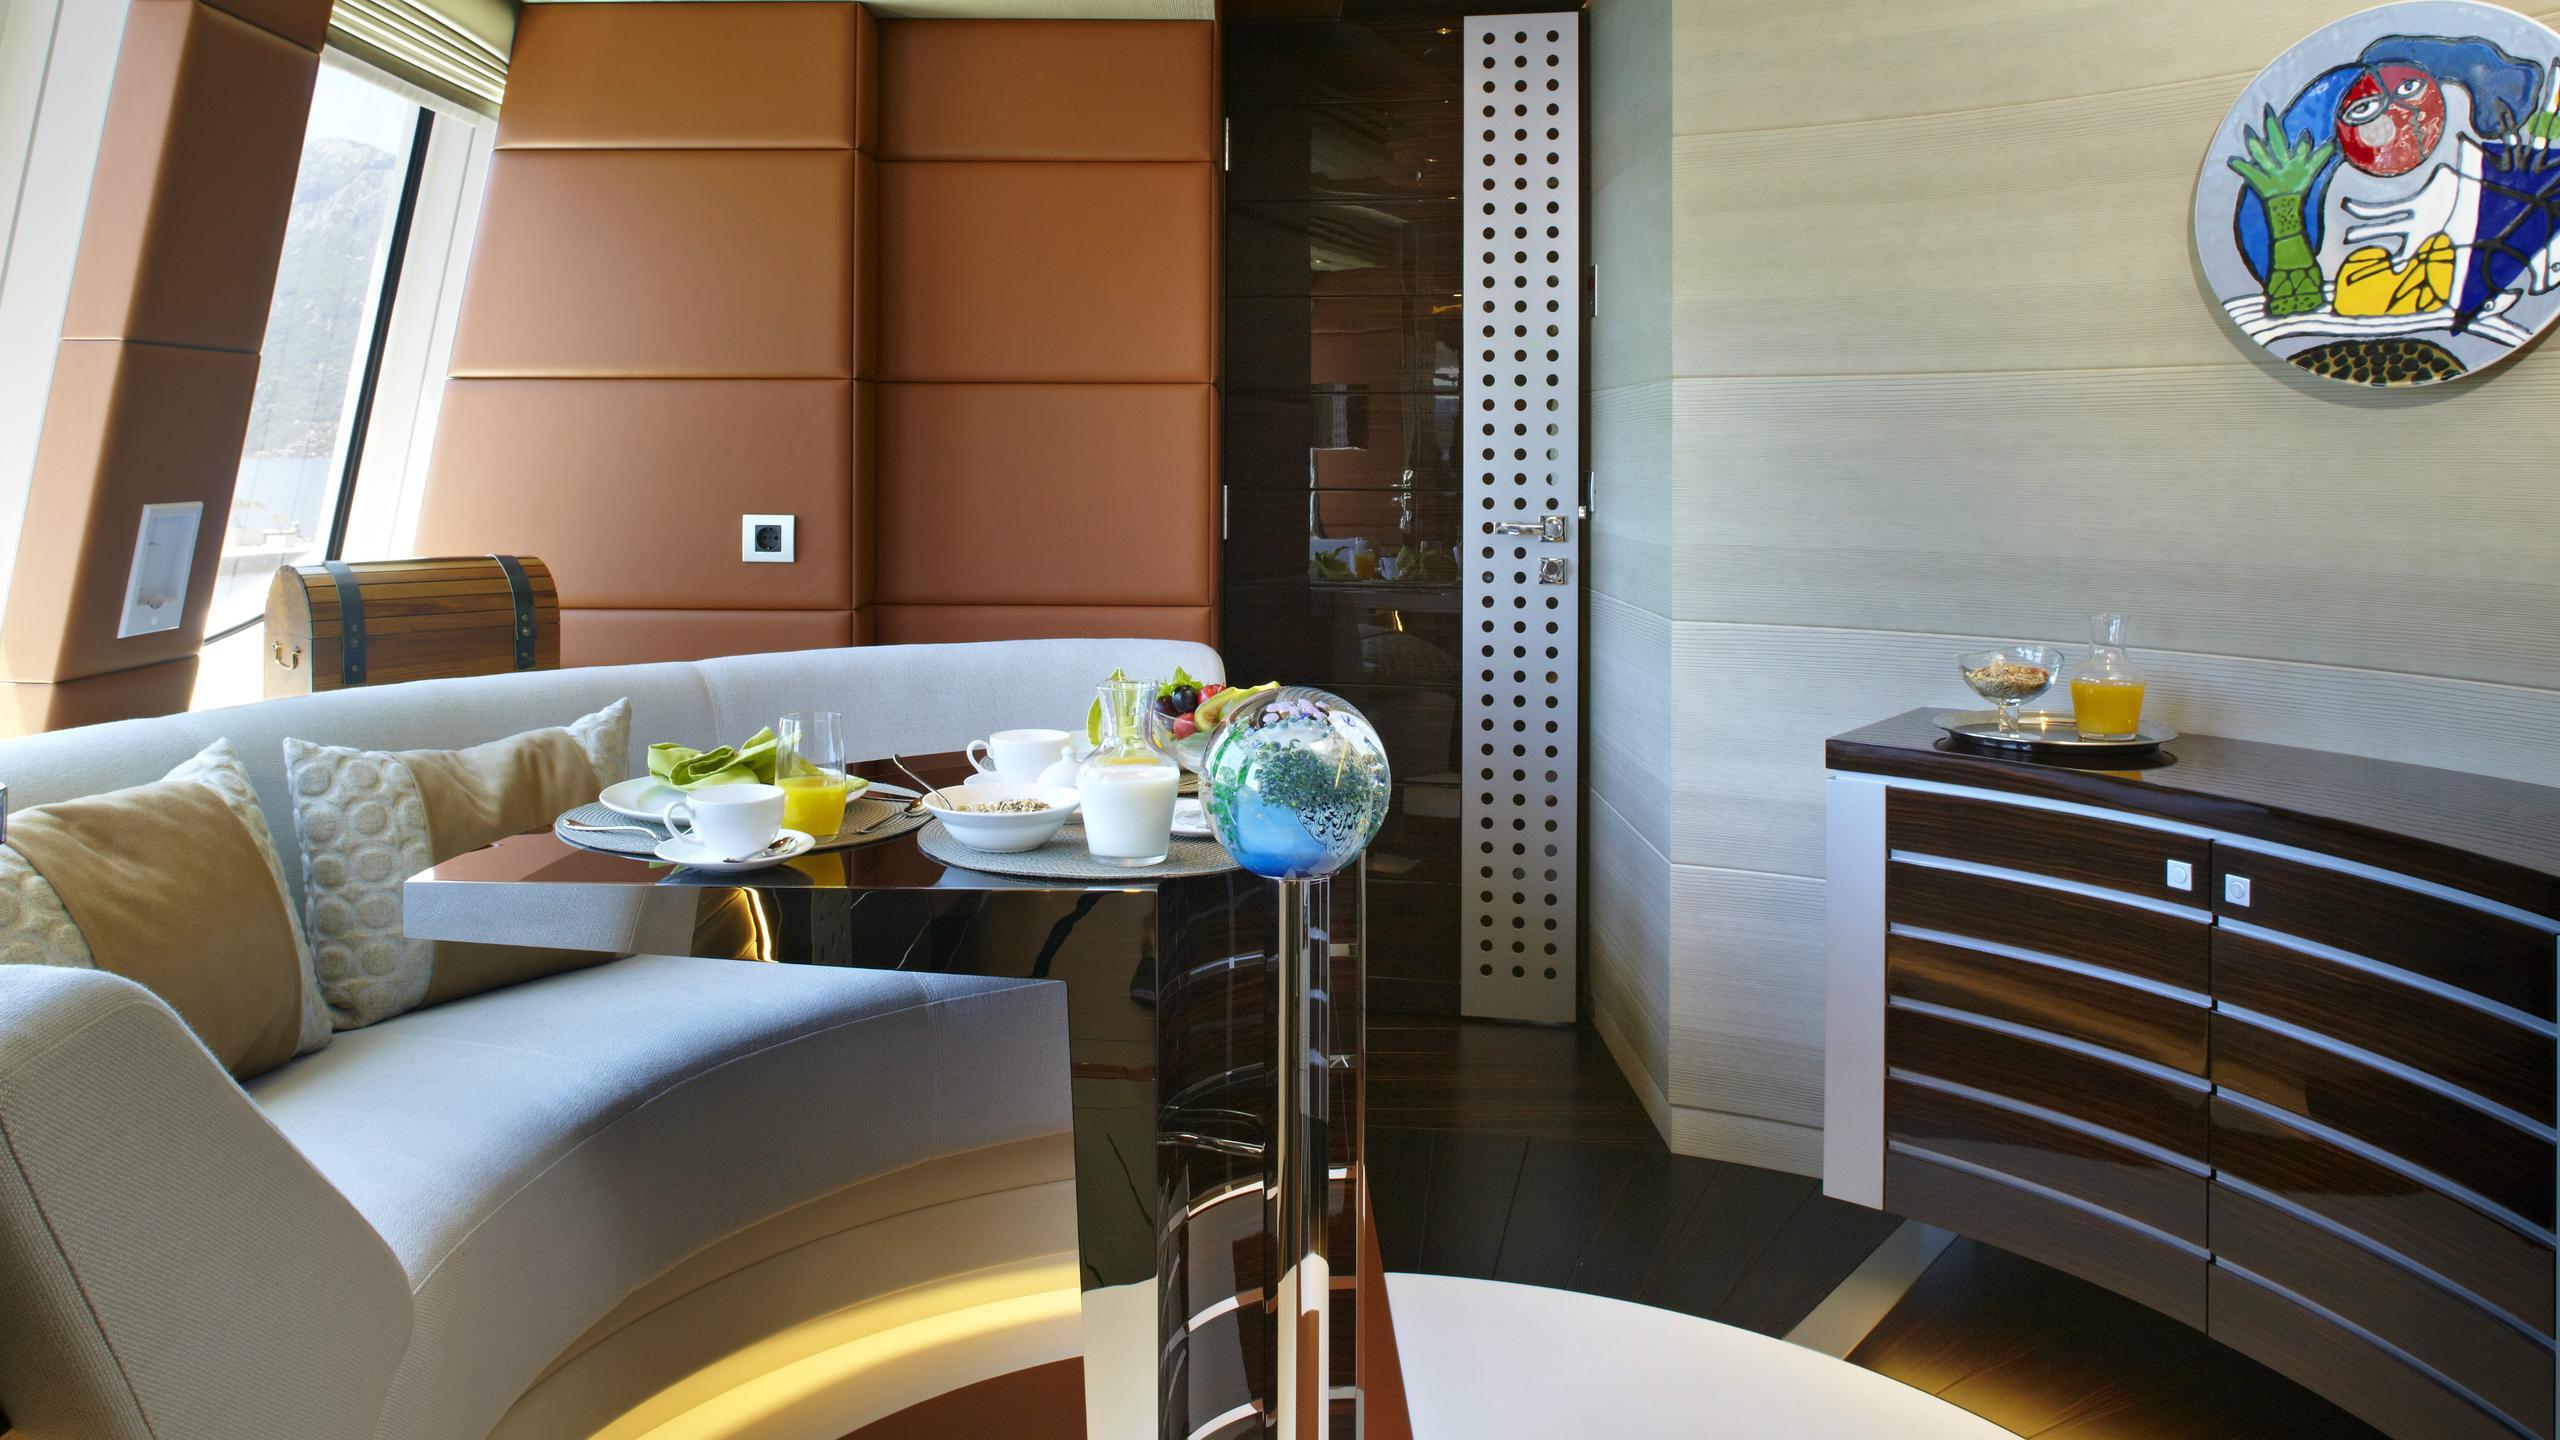 odyssea-como-lady-petra-motor-yacht-heesen-2012-47m-circular-saloon